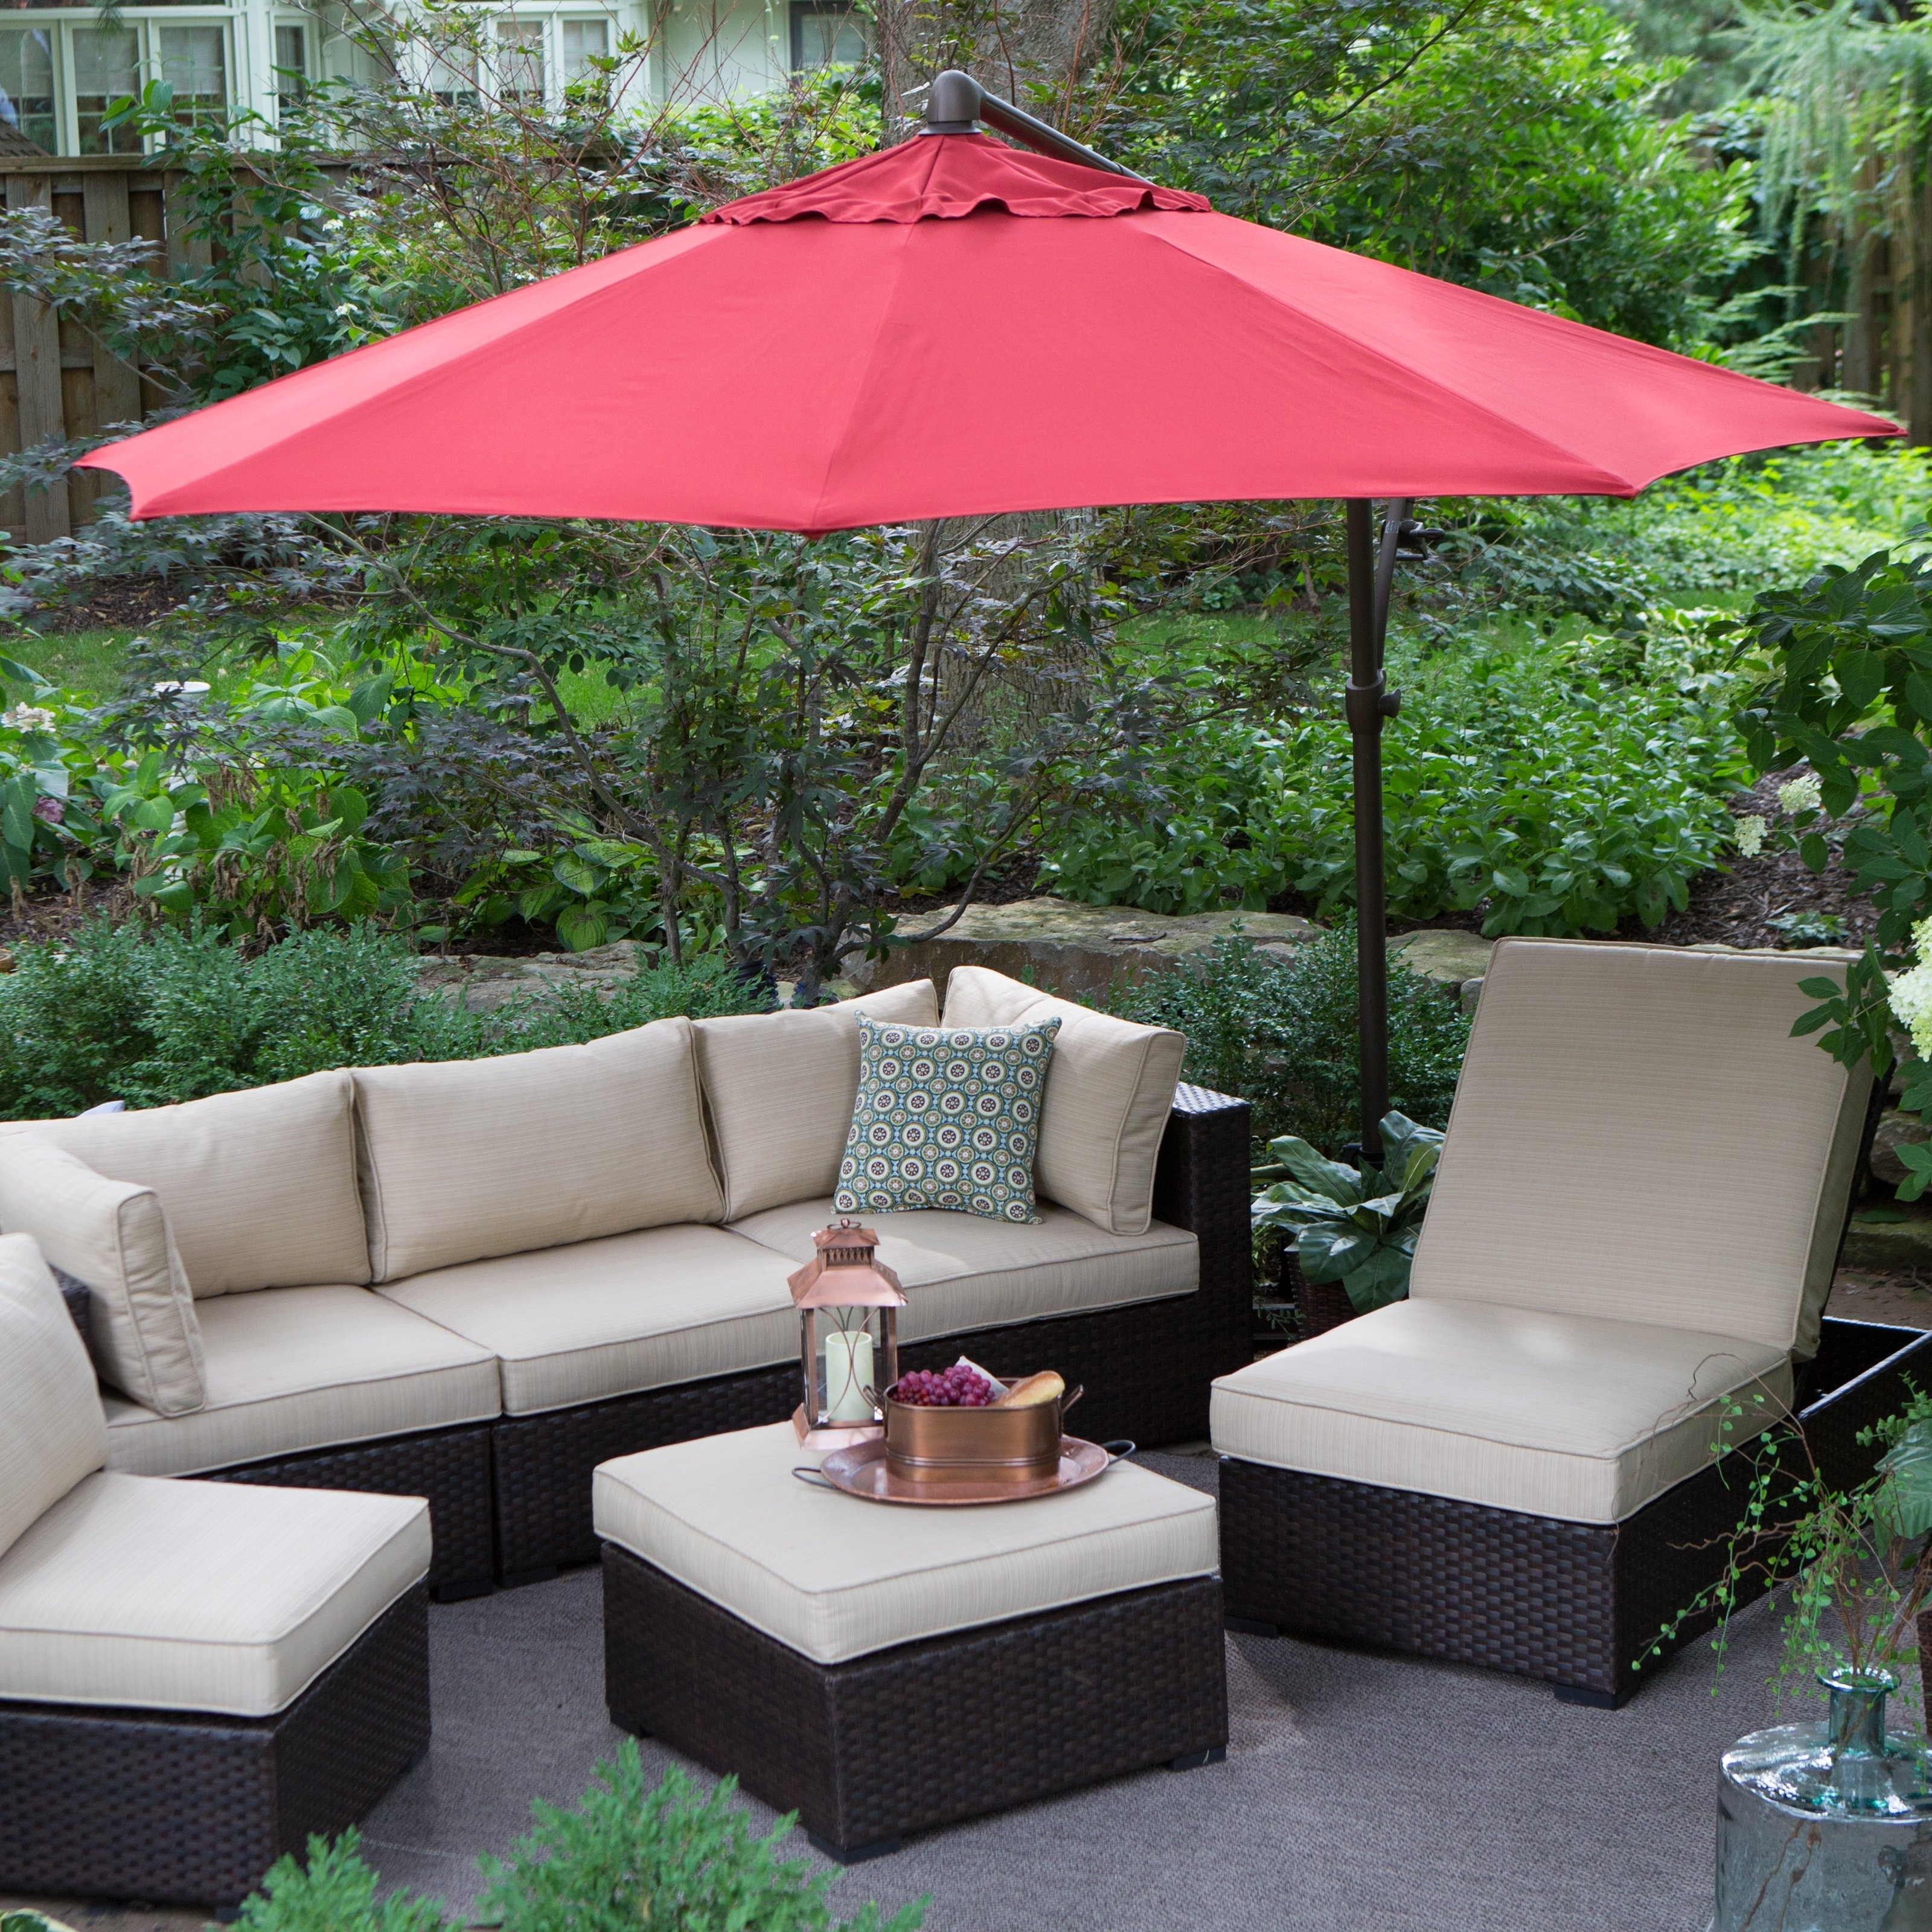 Treasure Garden 6 Ft. Sunbrella Aluminum Push Button Tilt Patio Throughout Best And Newest Red Sunbrella Patio Umbrellas (Gallery 10 of 20)